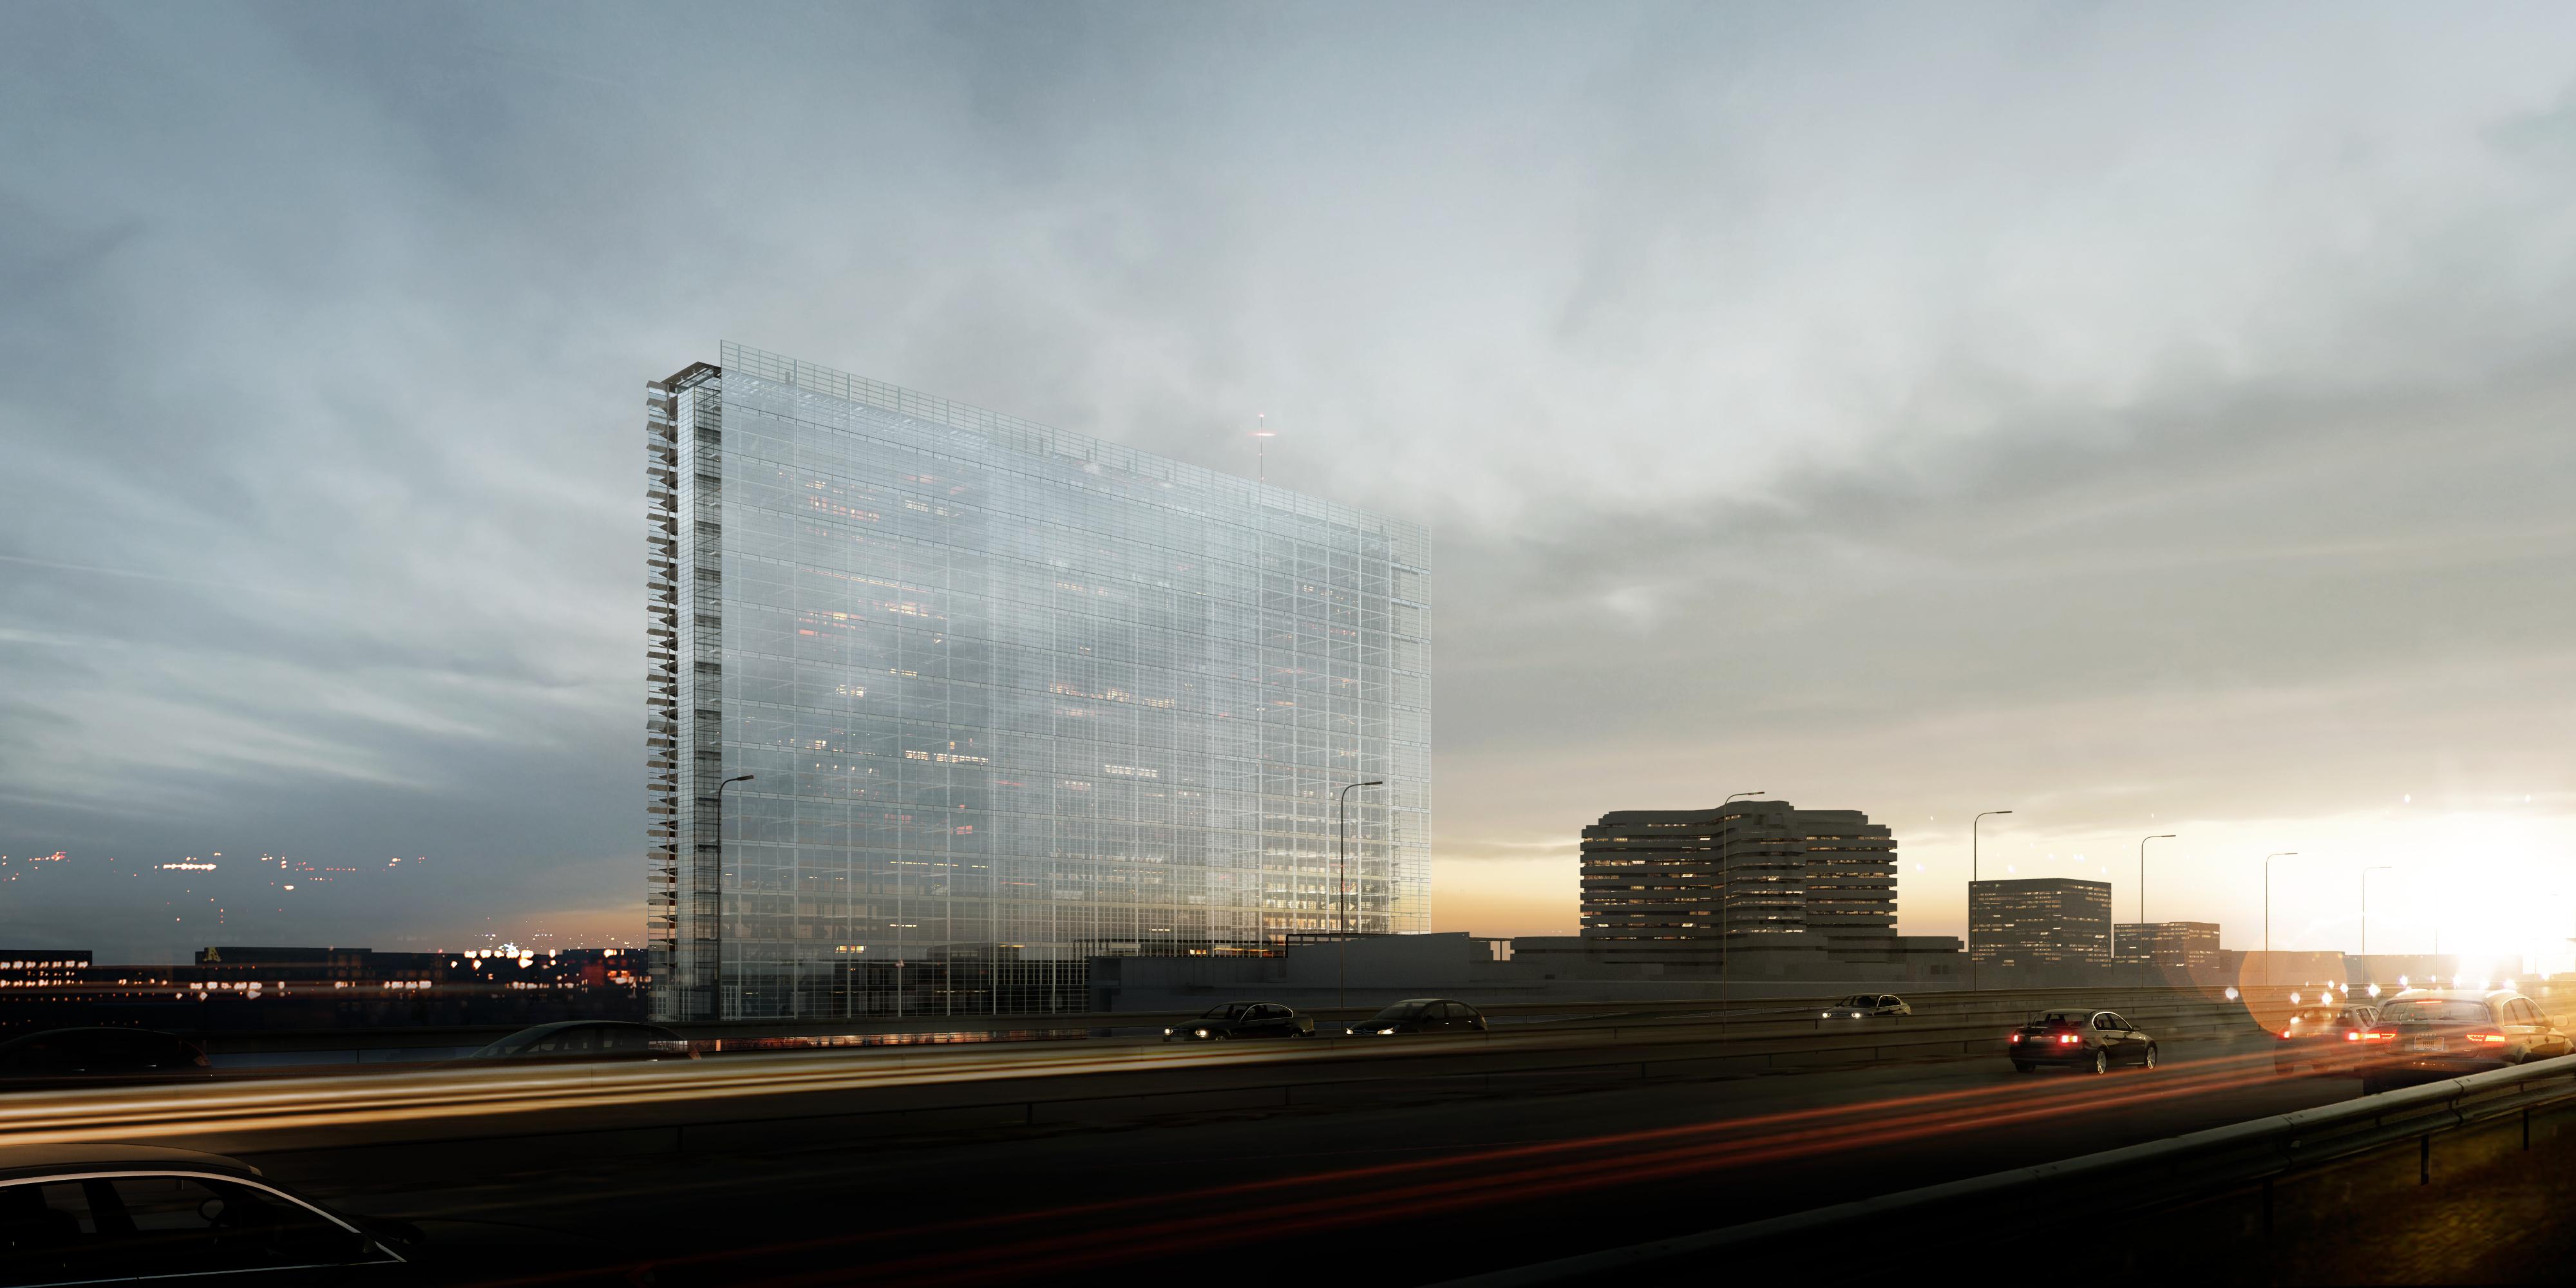 <p>beeld: Ateliers Jean Nouvel, Dam &#038; Partners, New Main B.V. &#8211; J.P. van Eesteren | Croon | Wolter &#038; Dros | TBI</p>